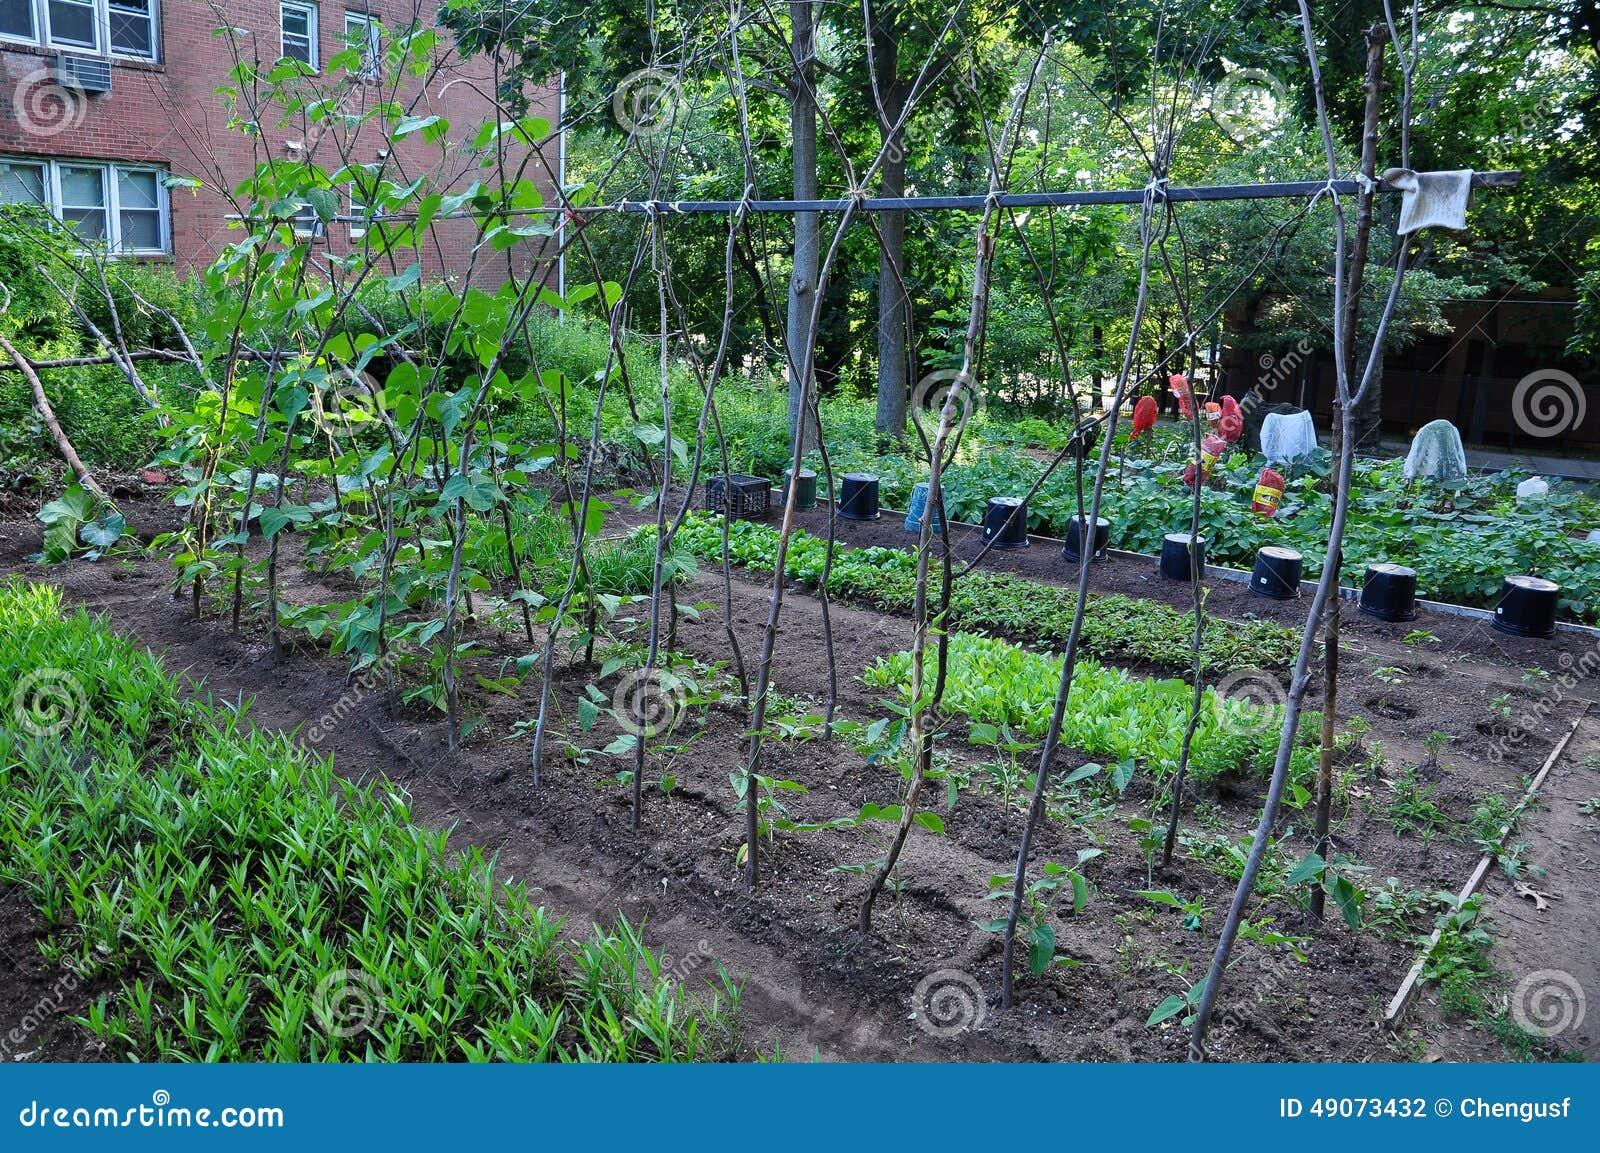 Community Vegetable Garden Stock Photo Image 49073432